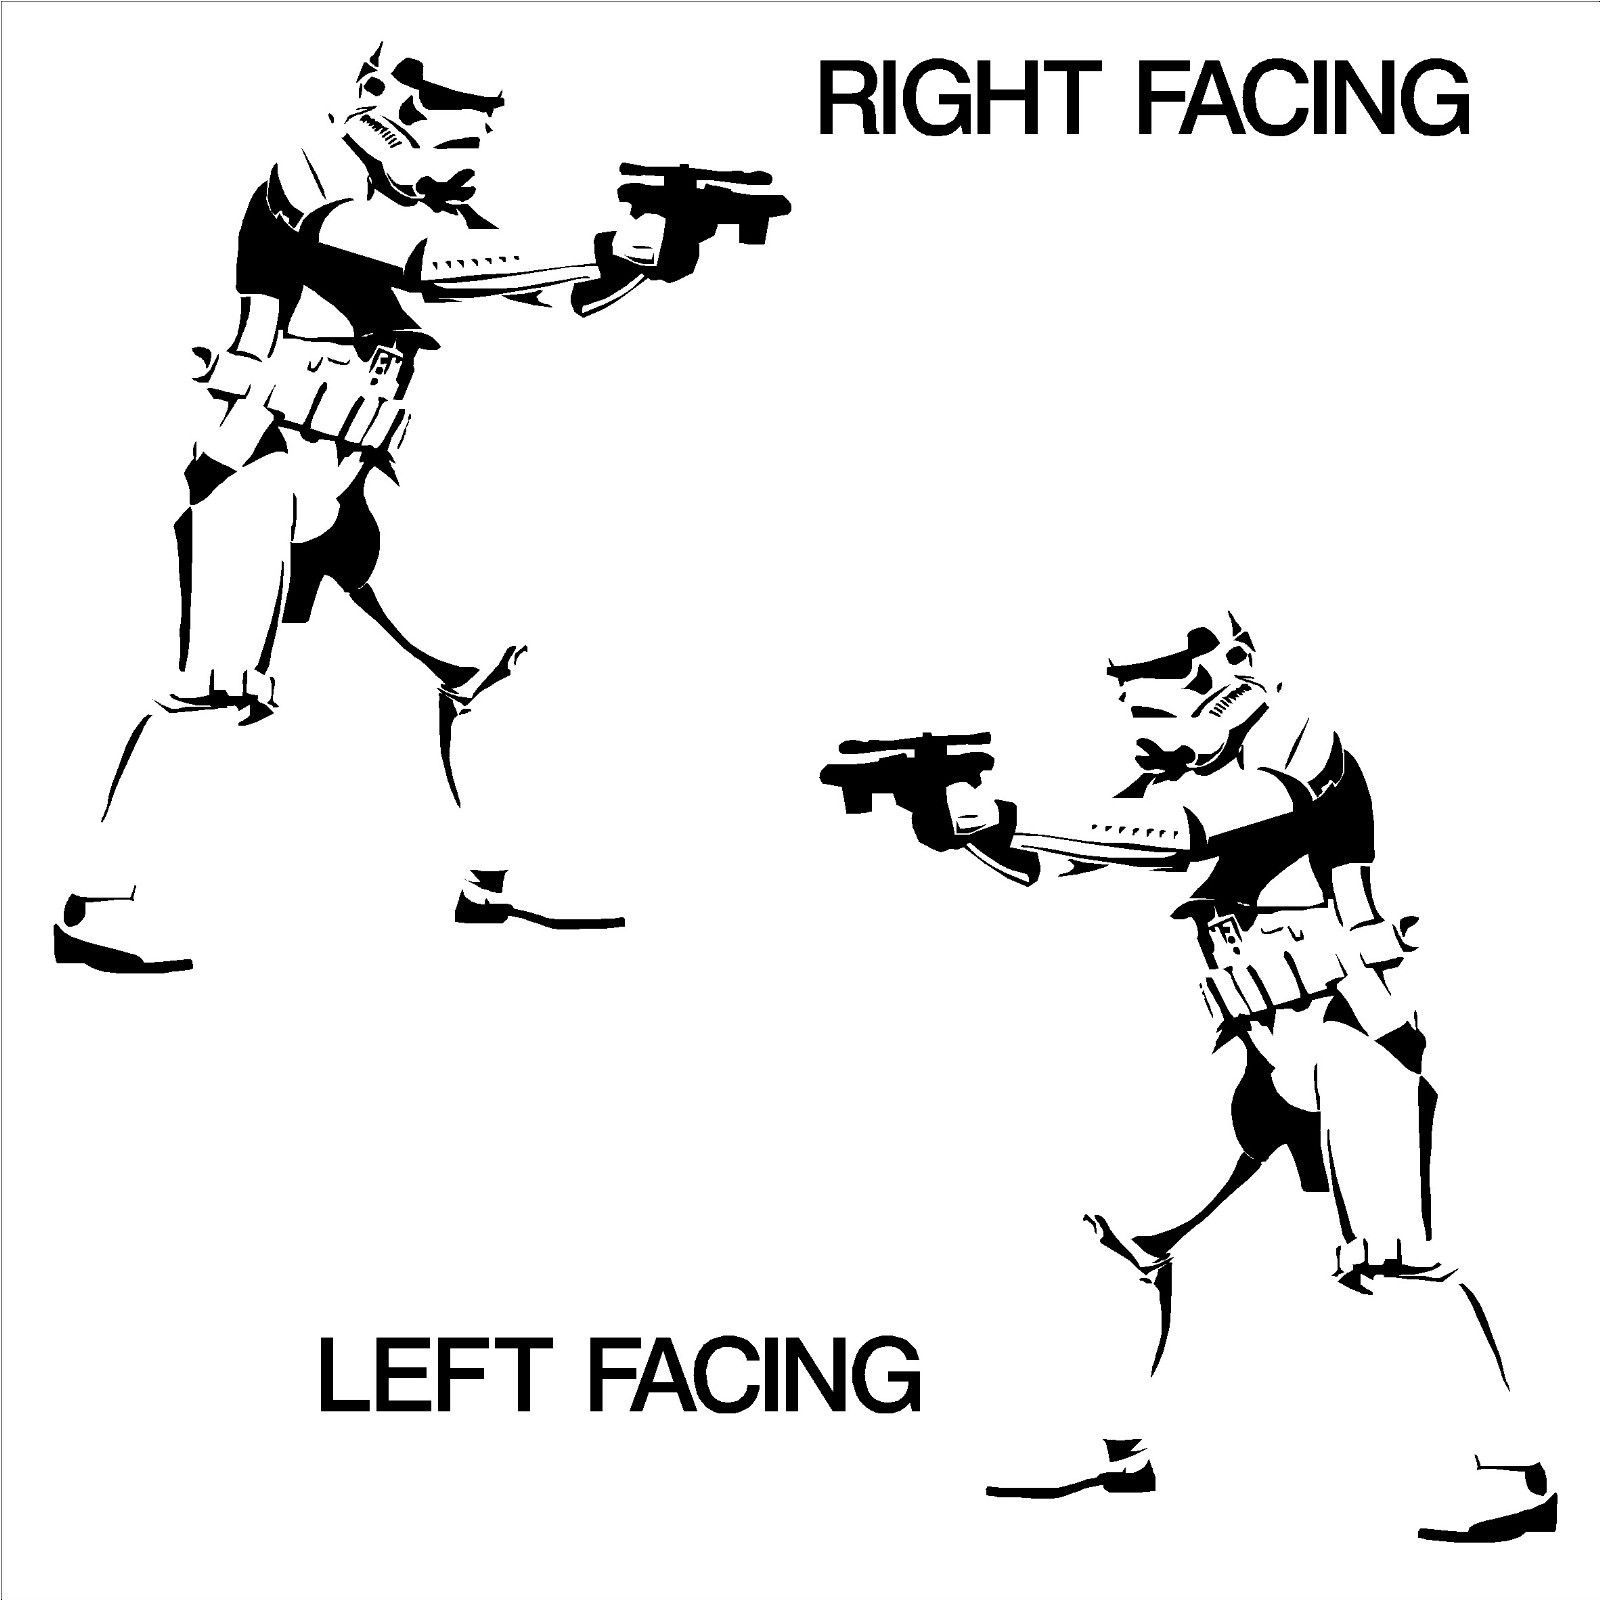 Star wars storm trooper wall art vinyl room sticker decal movie stencil